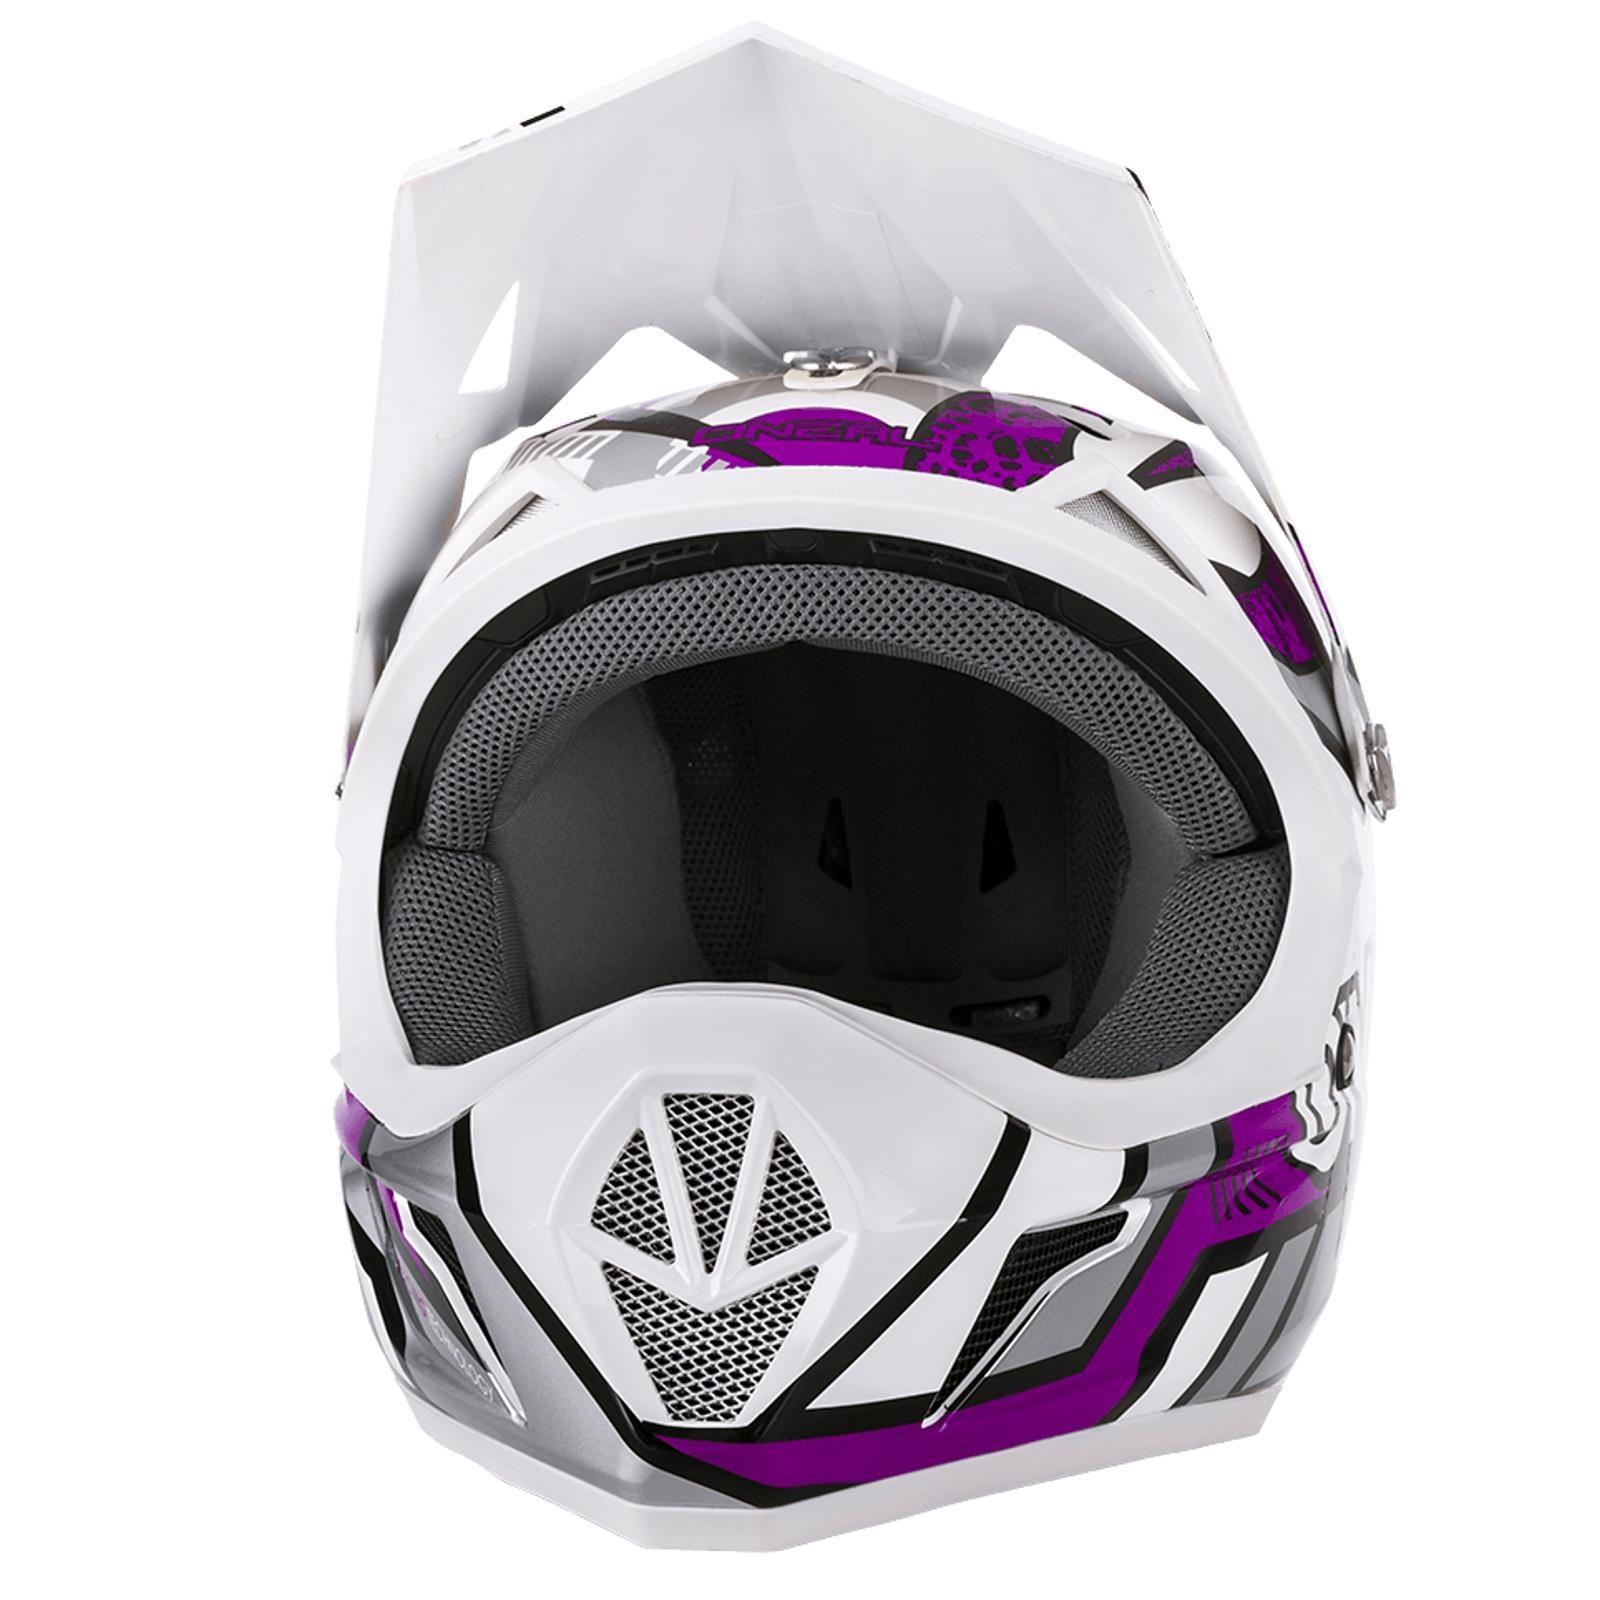 Indexbild 25 - ONeal-Sonus-Strike-Fahrrad-Helm-All-Mountain-Bike-MTB-Downhill-Fullface-Fidlock